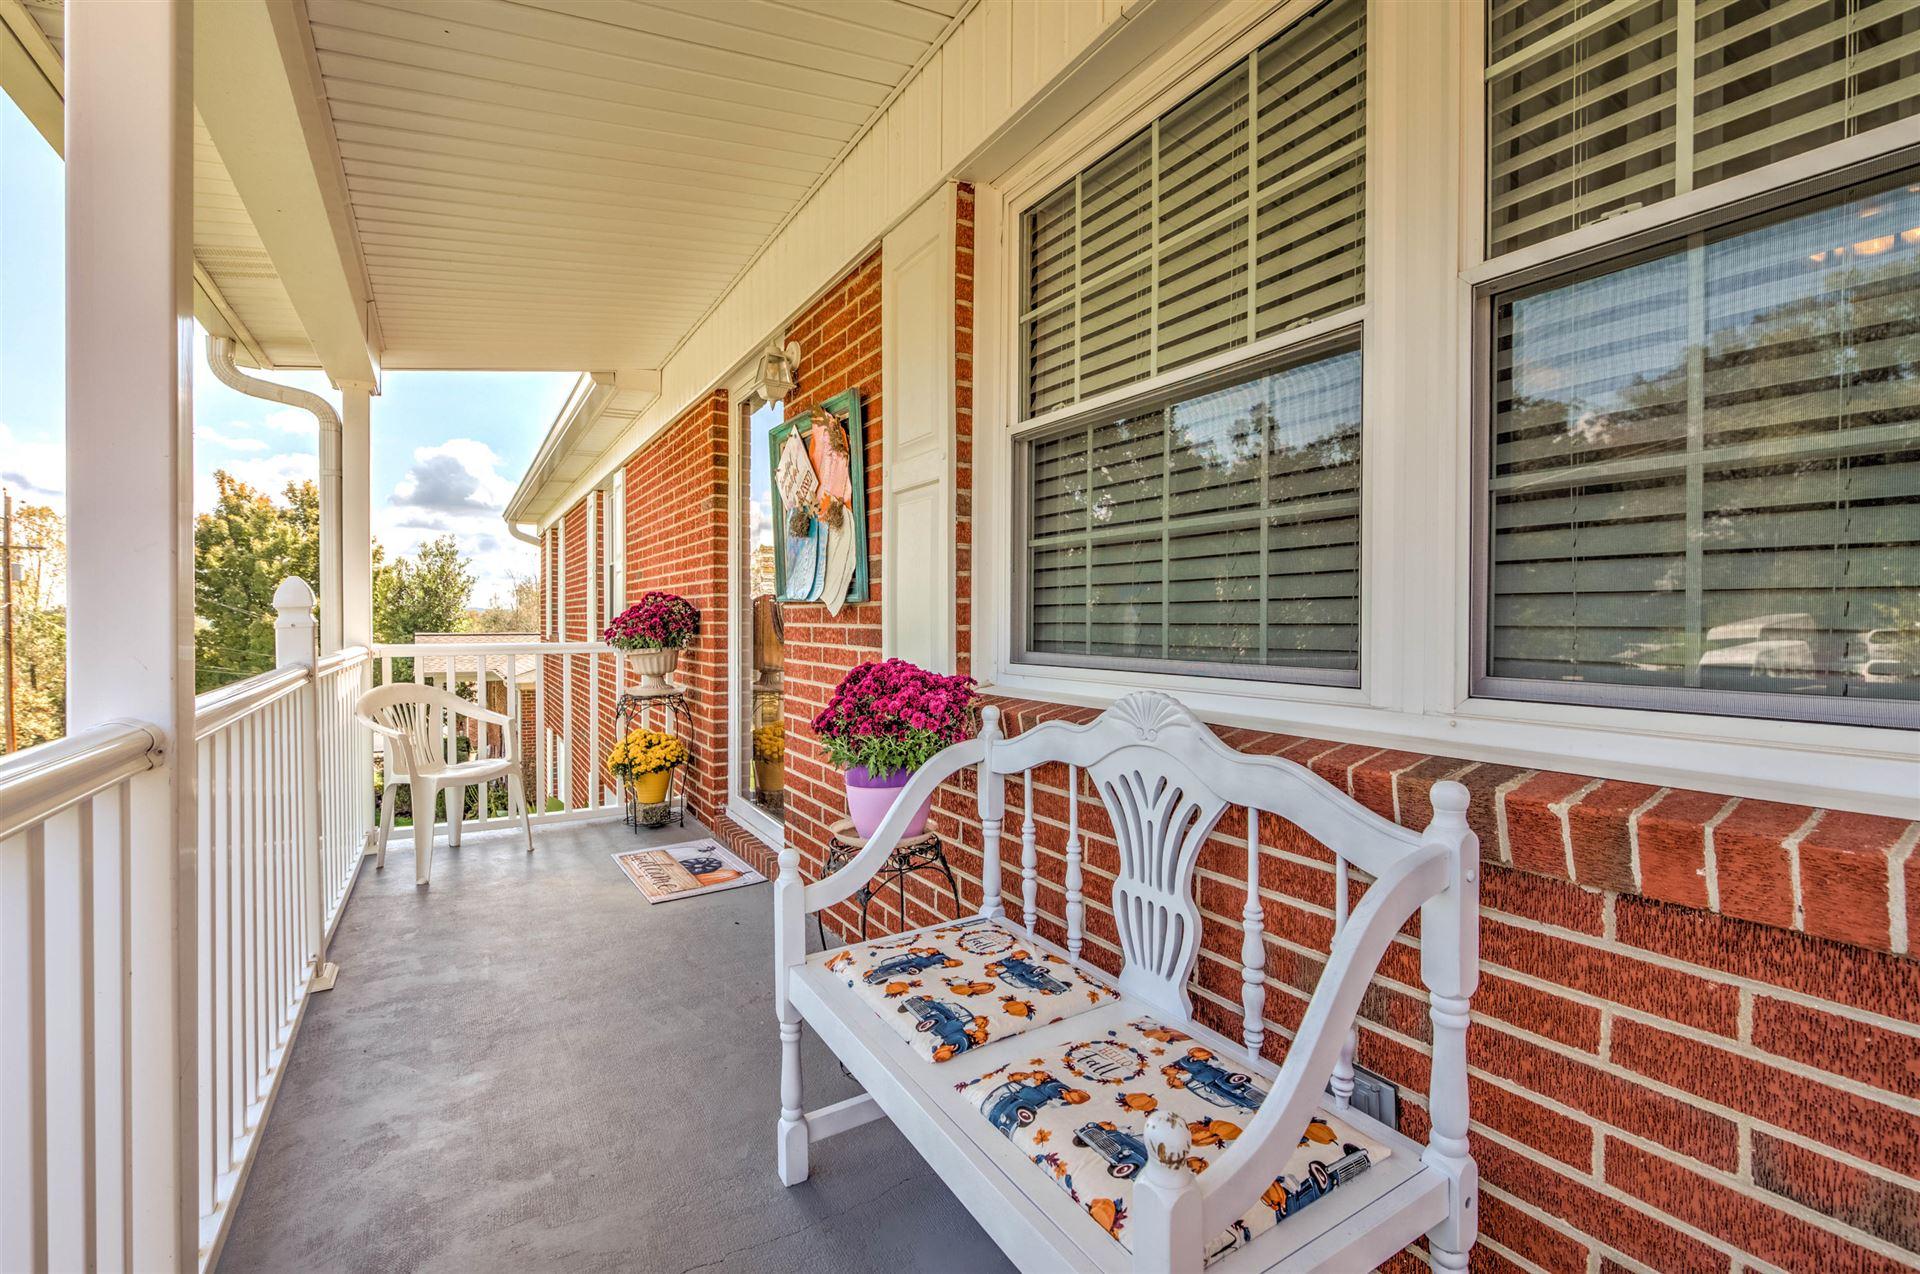 Photo of 108 Westoak Drive, Clinton, TN 37716 (MLS # 1133255)